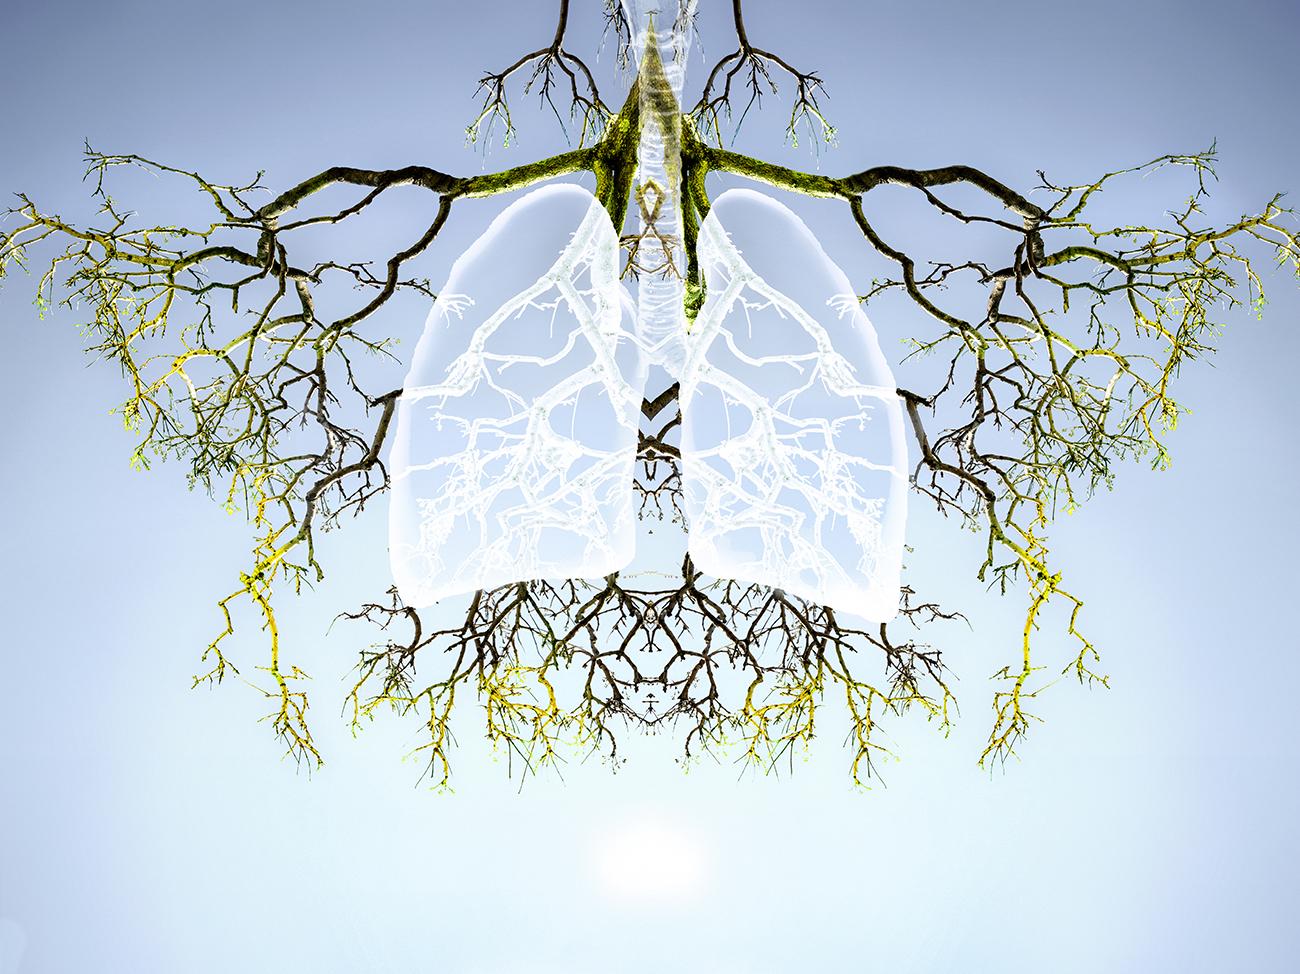 Karin_Hauser_ Beneath The Canopy_#9a.jpg